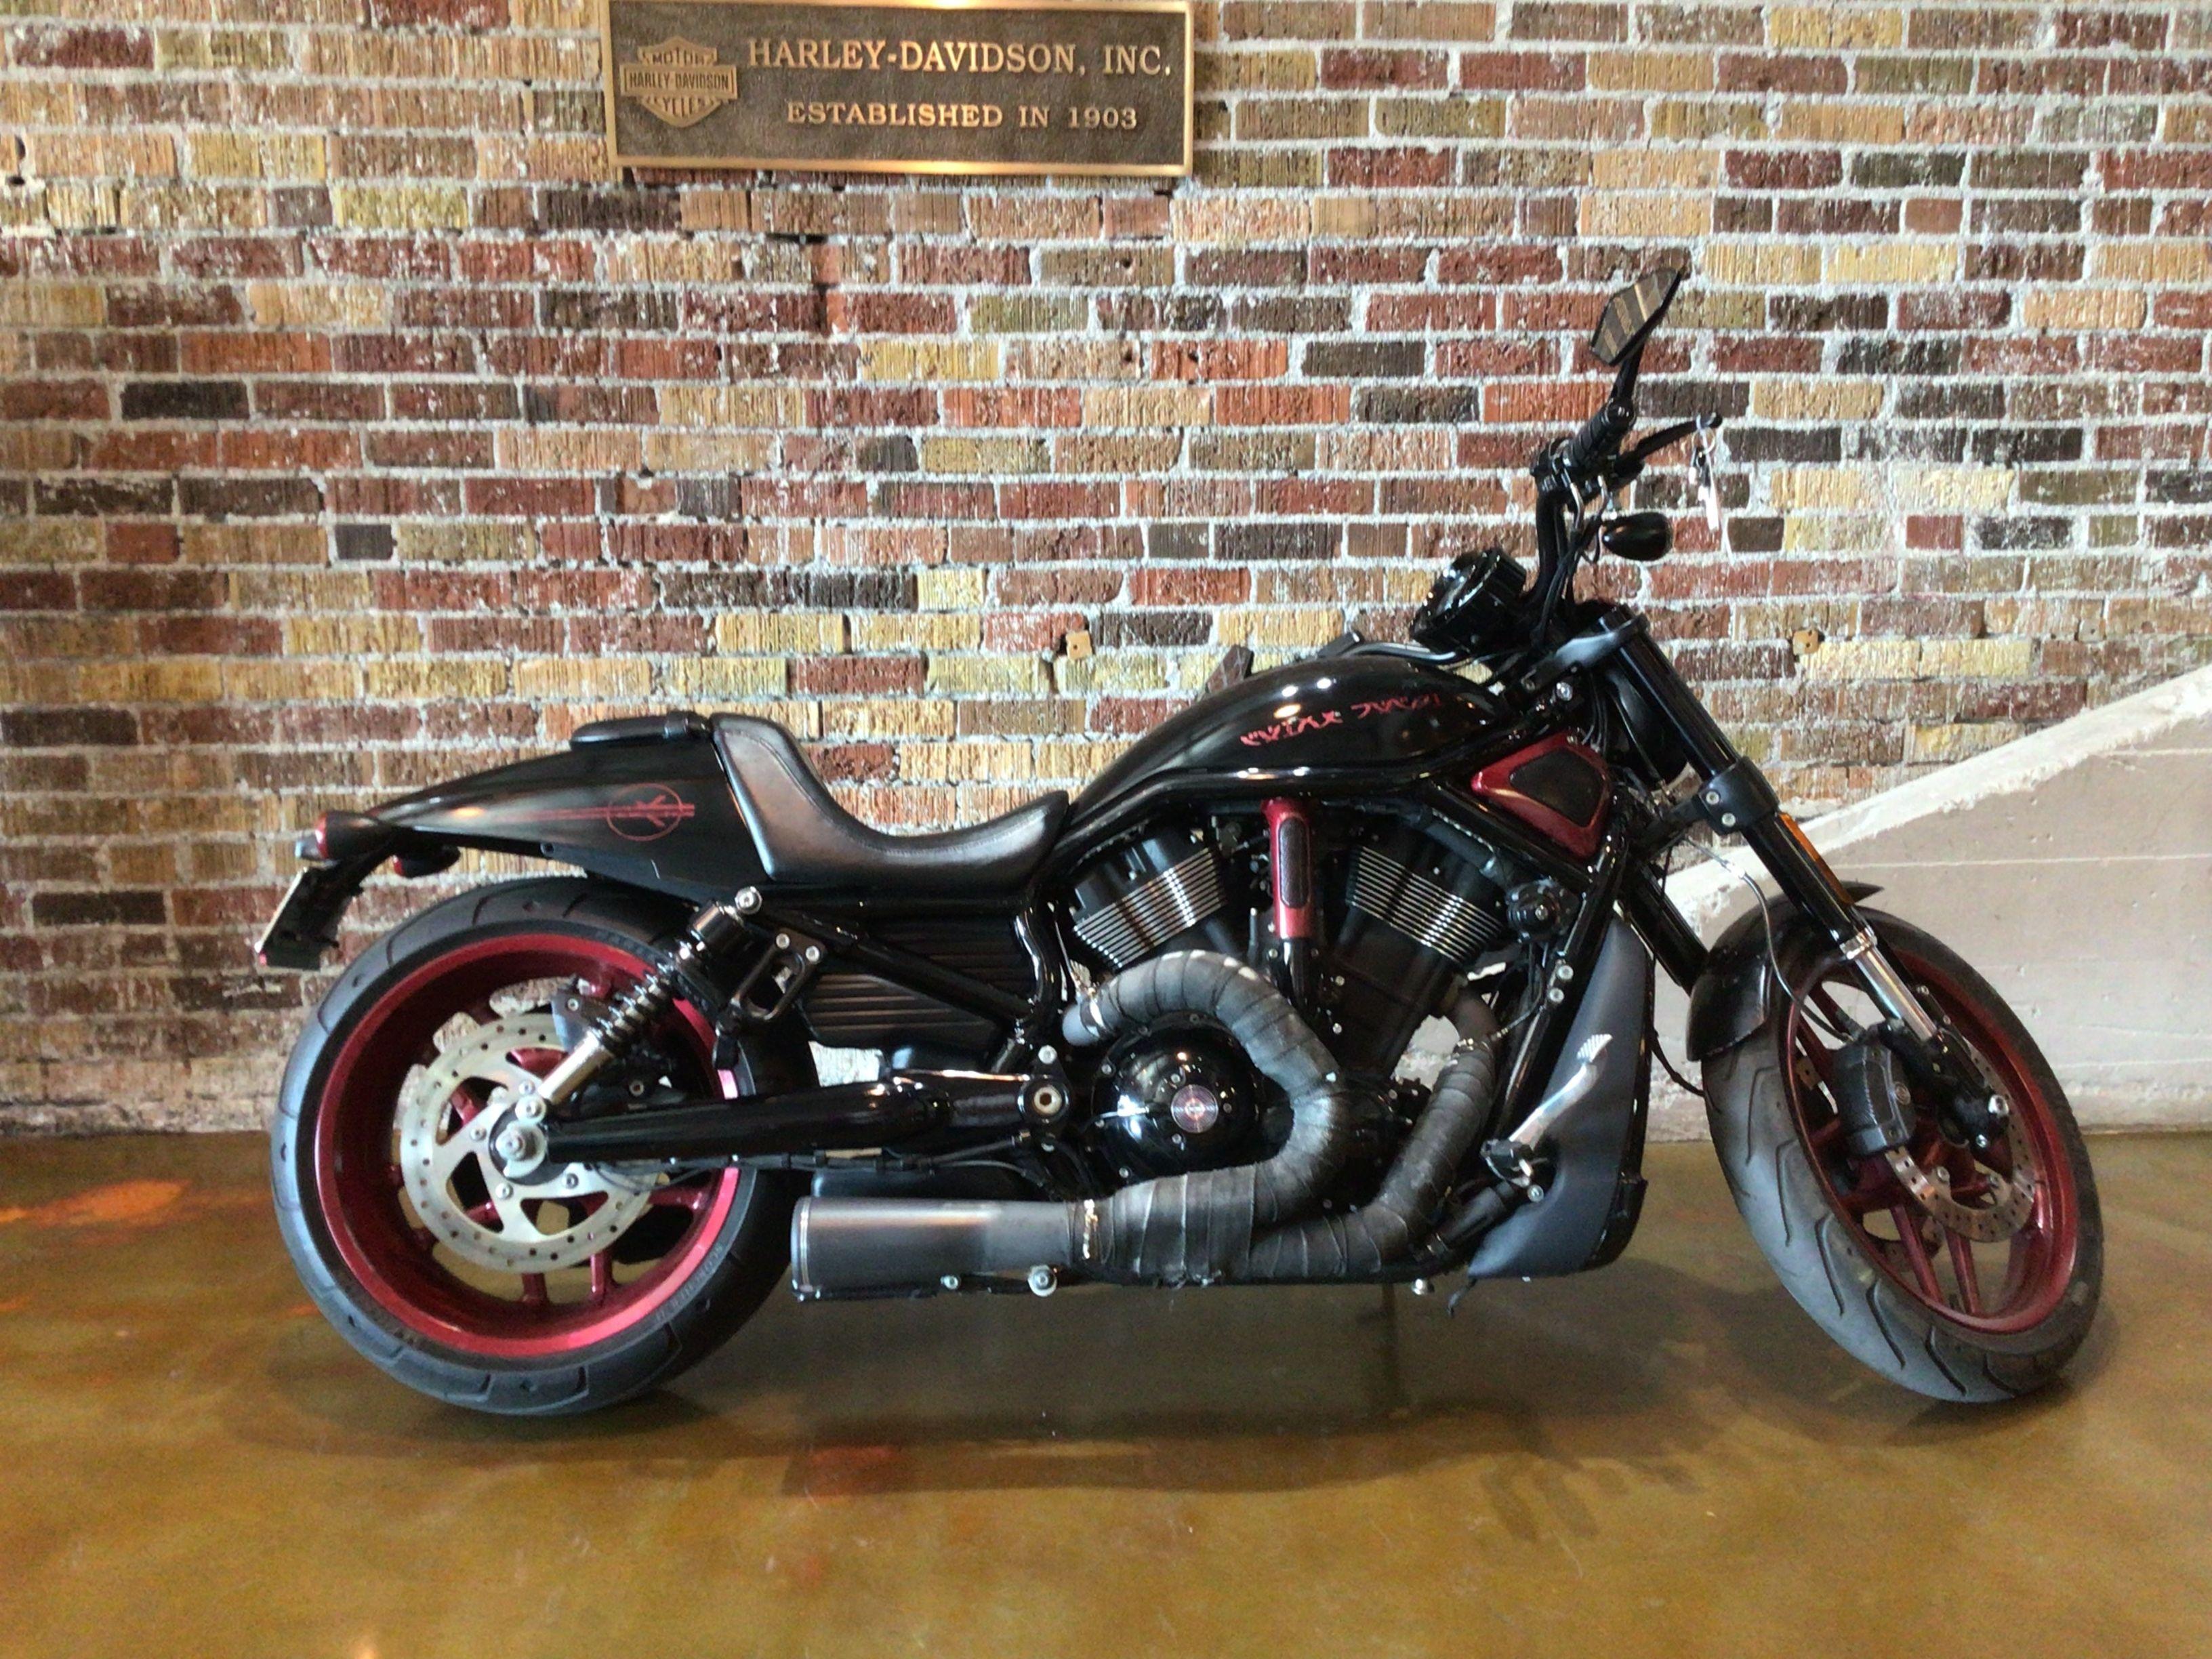 2014 Harley-Davidson Night Rod Special